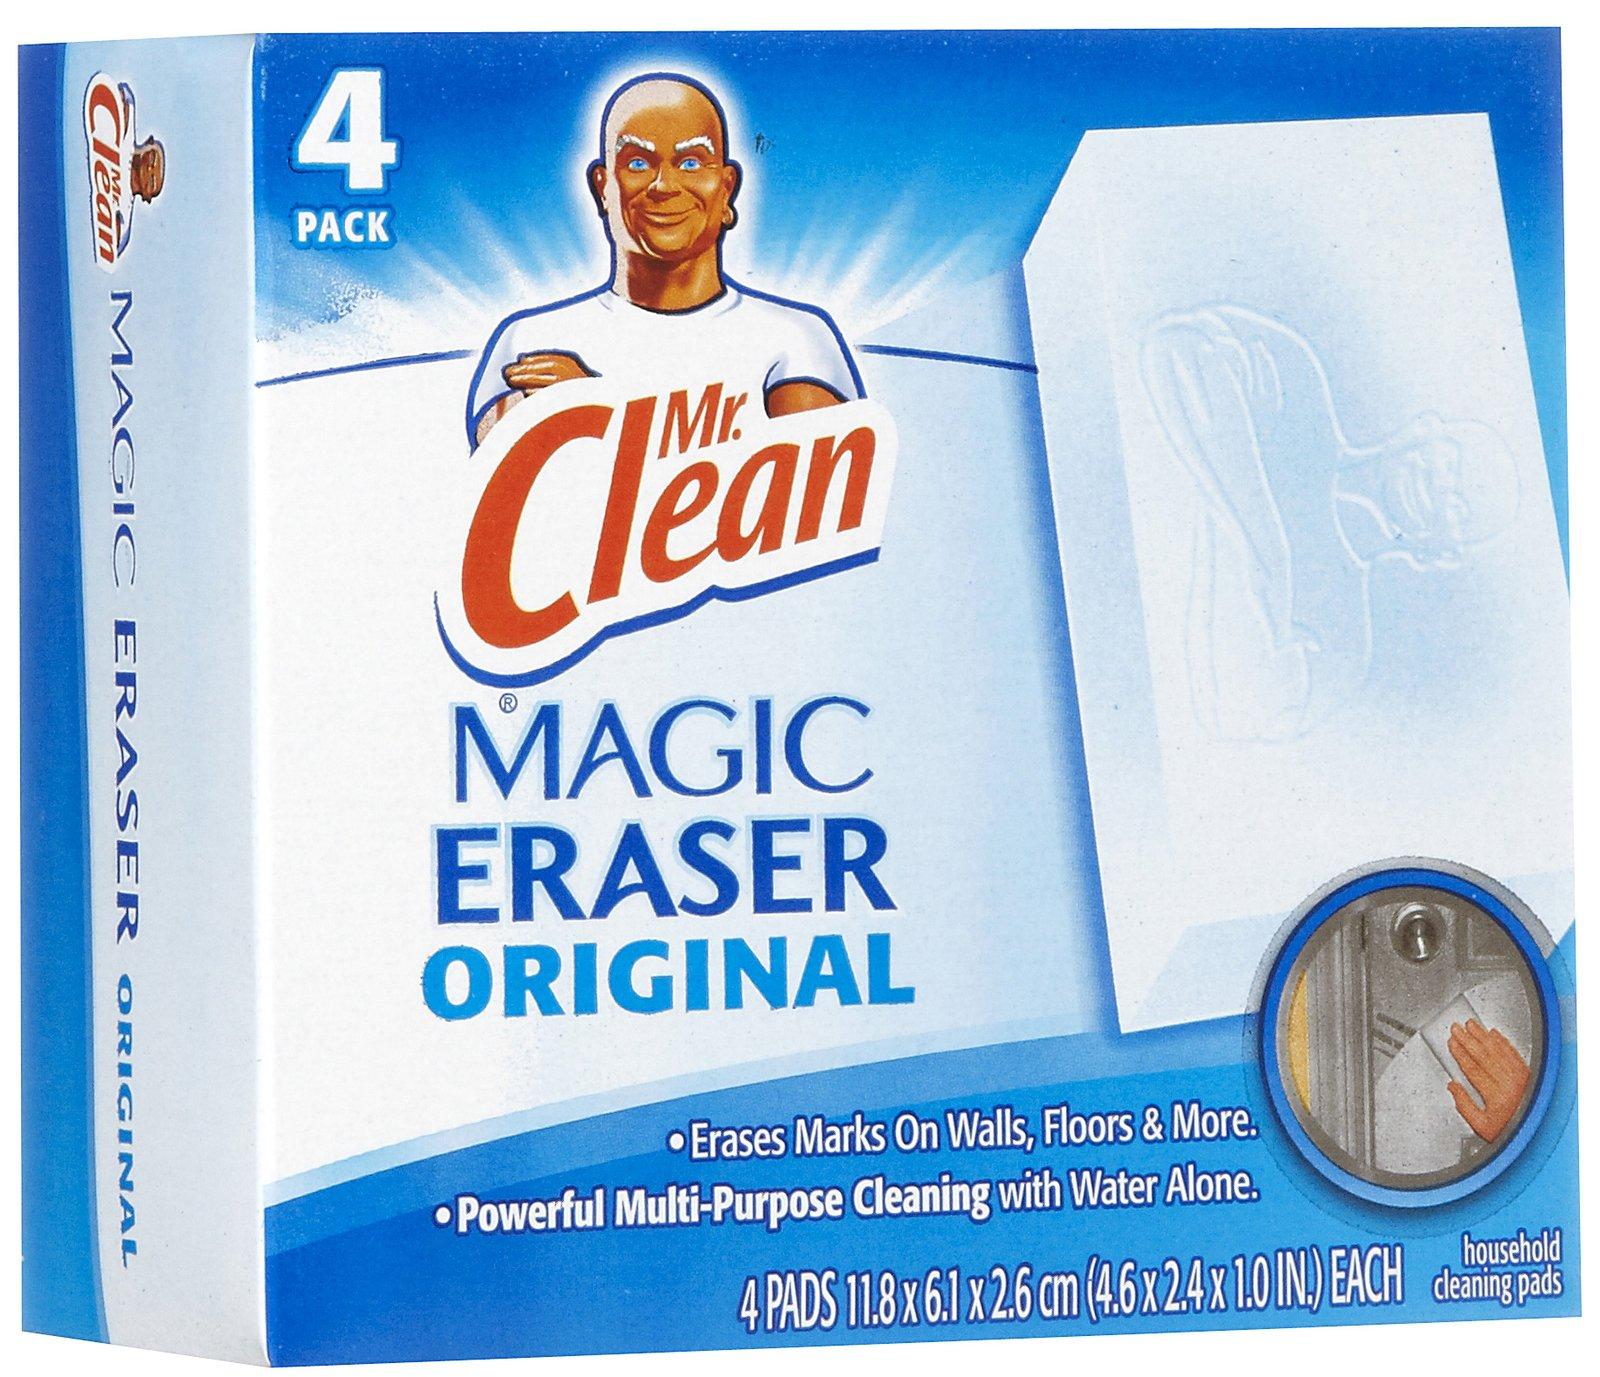 Mr Clean Magic Eraser Coupon